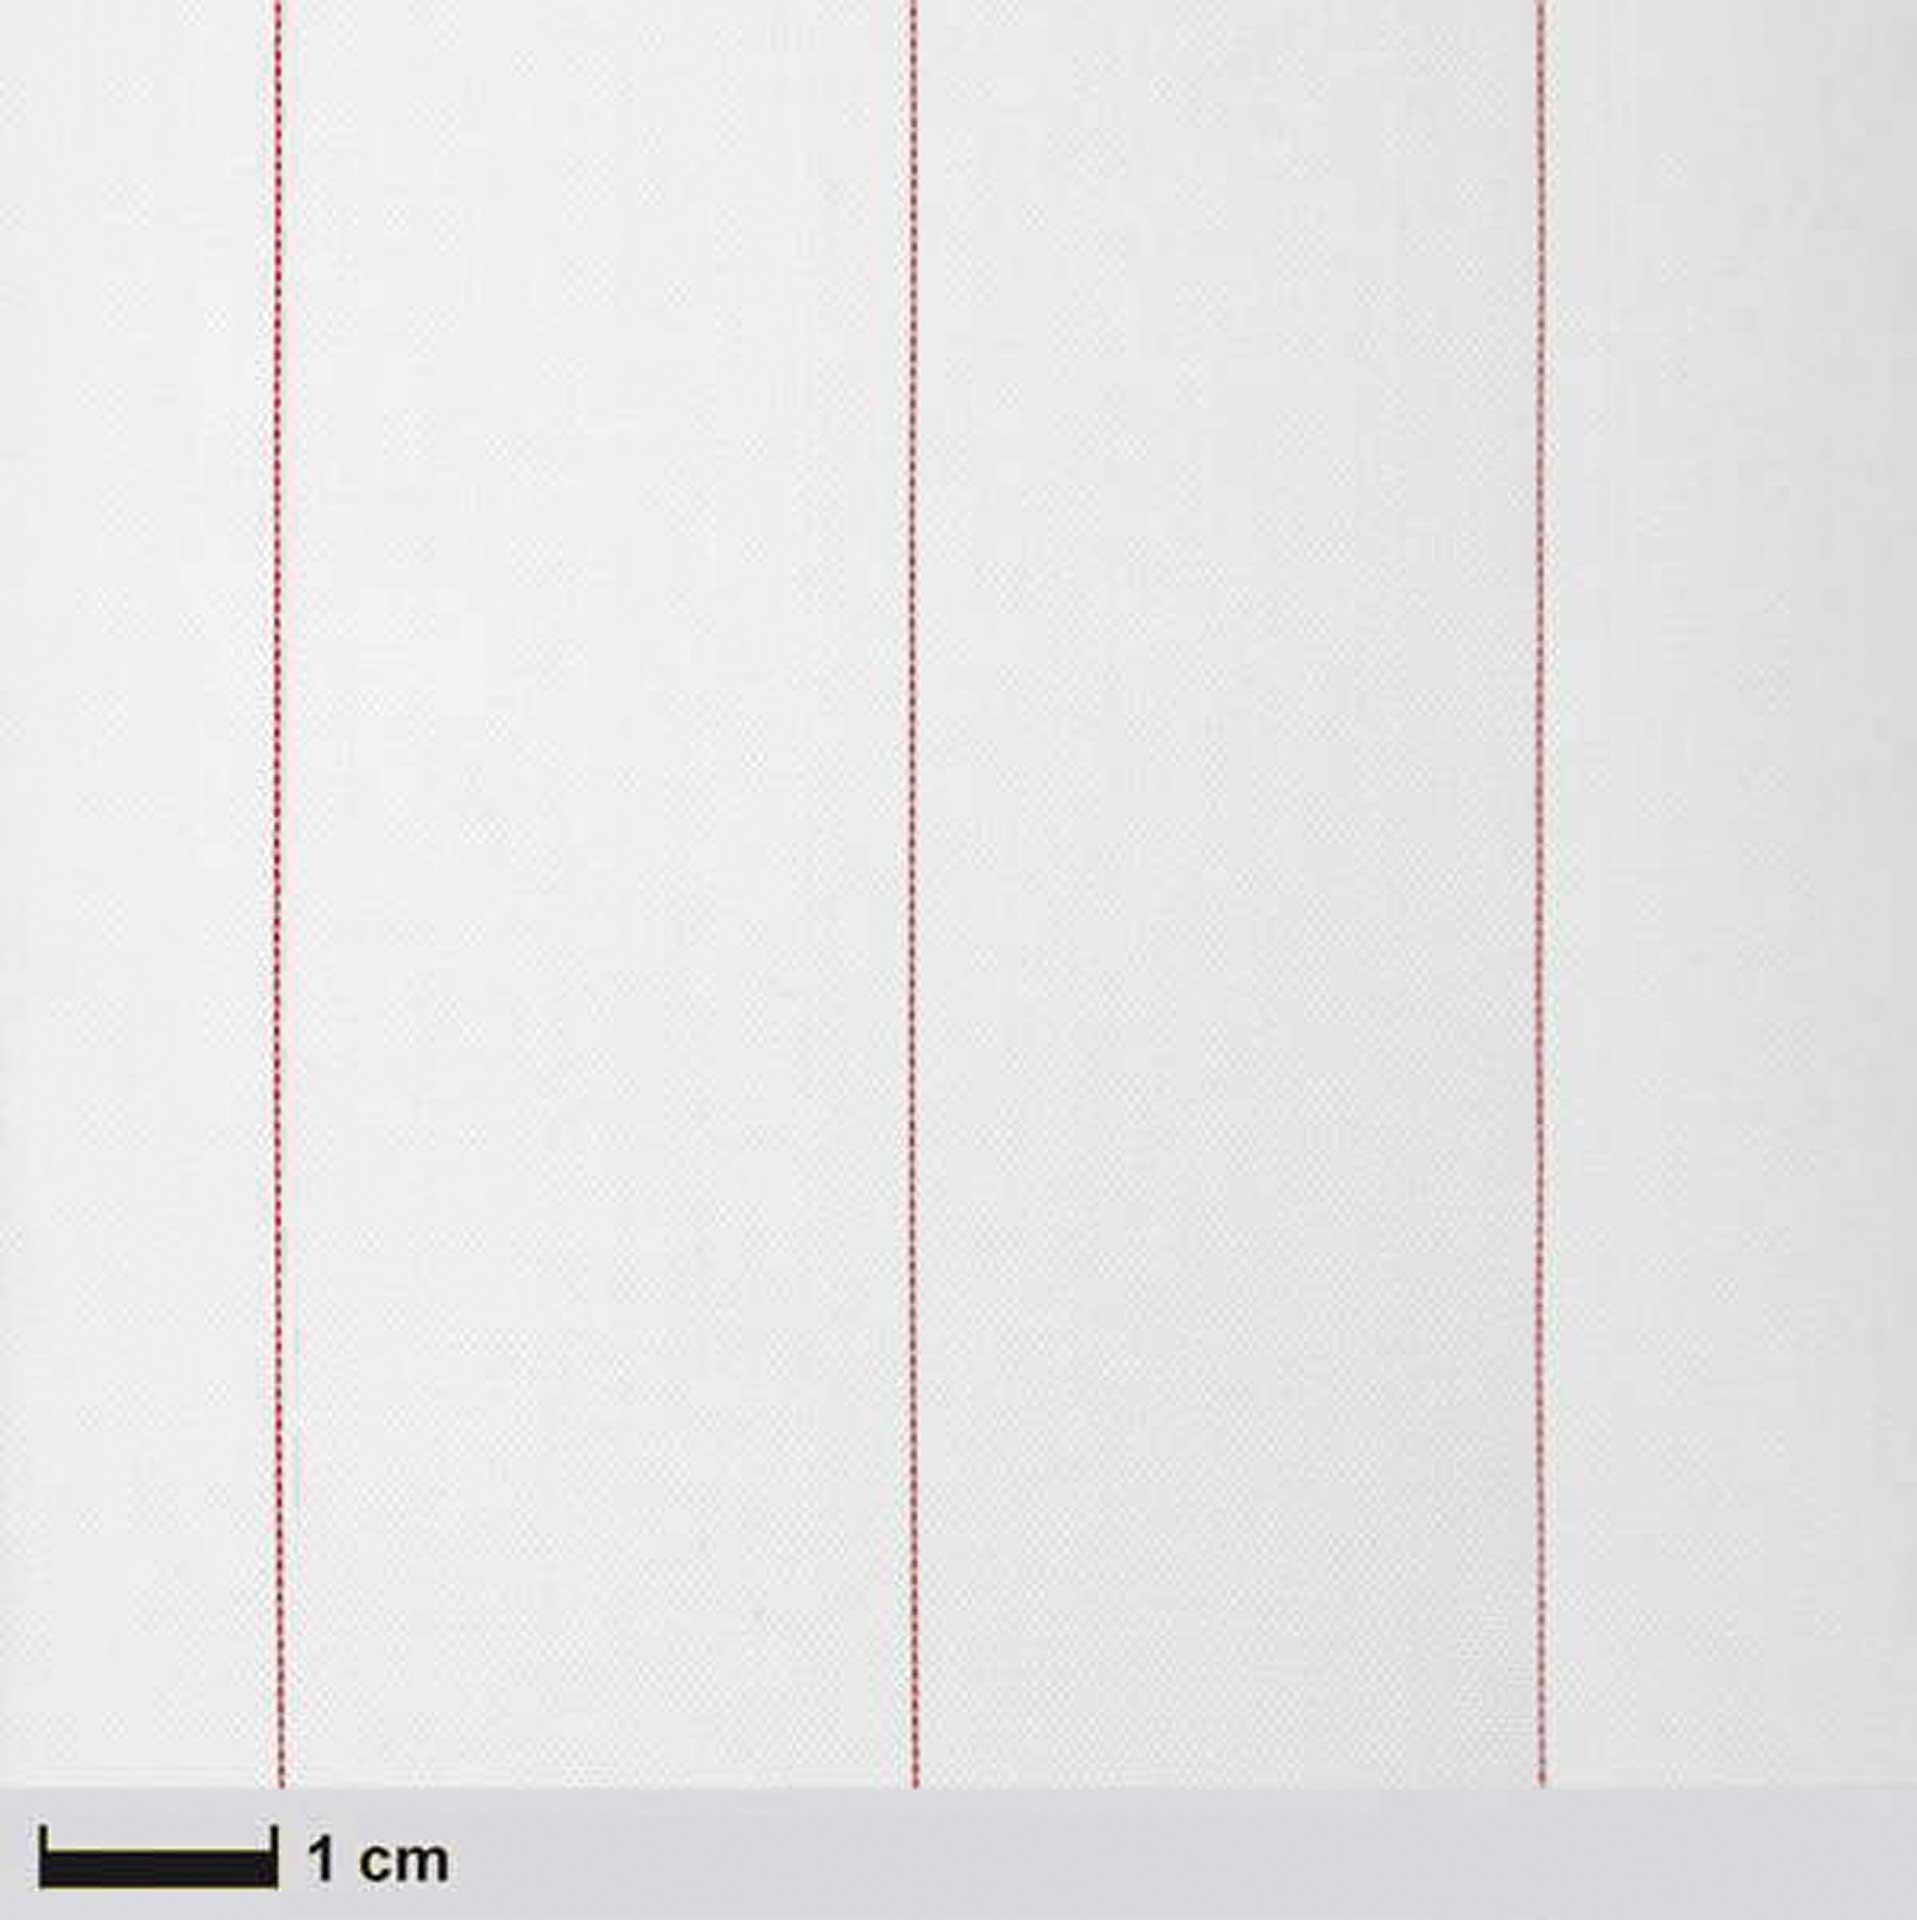 R&G Abreißgewebe 64 g/m² (Leinwand) 50 cm, Packung/ 2 m